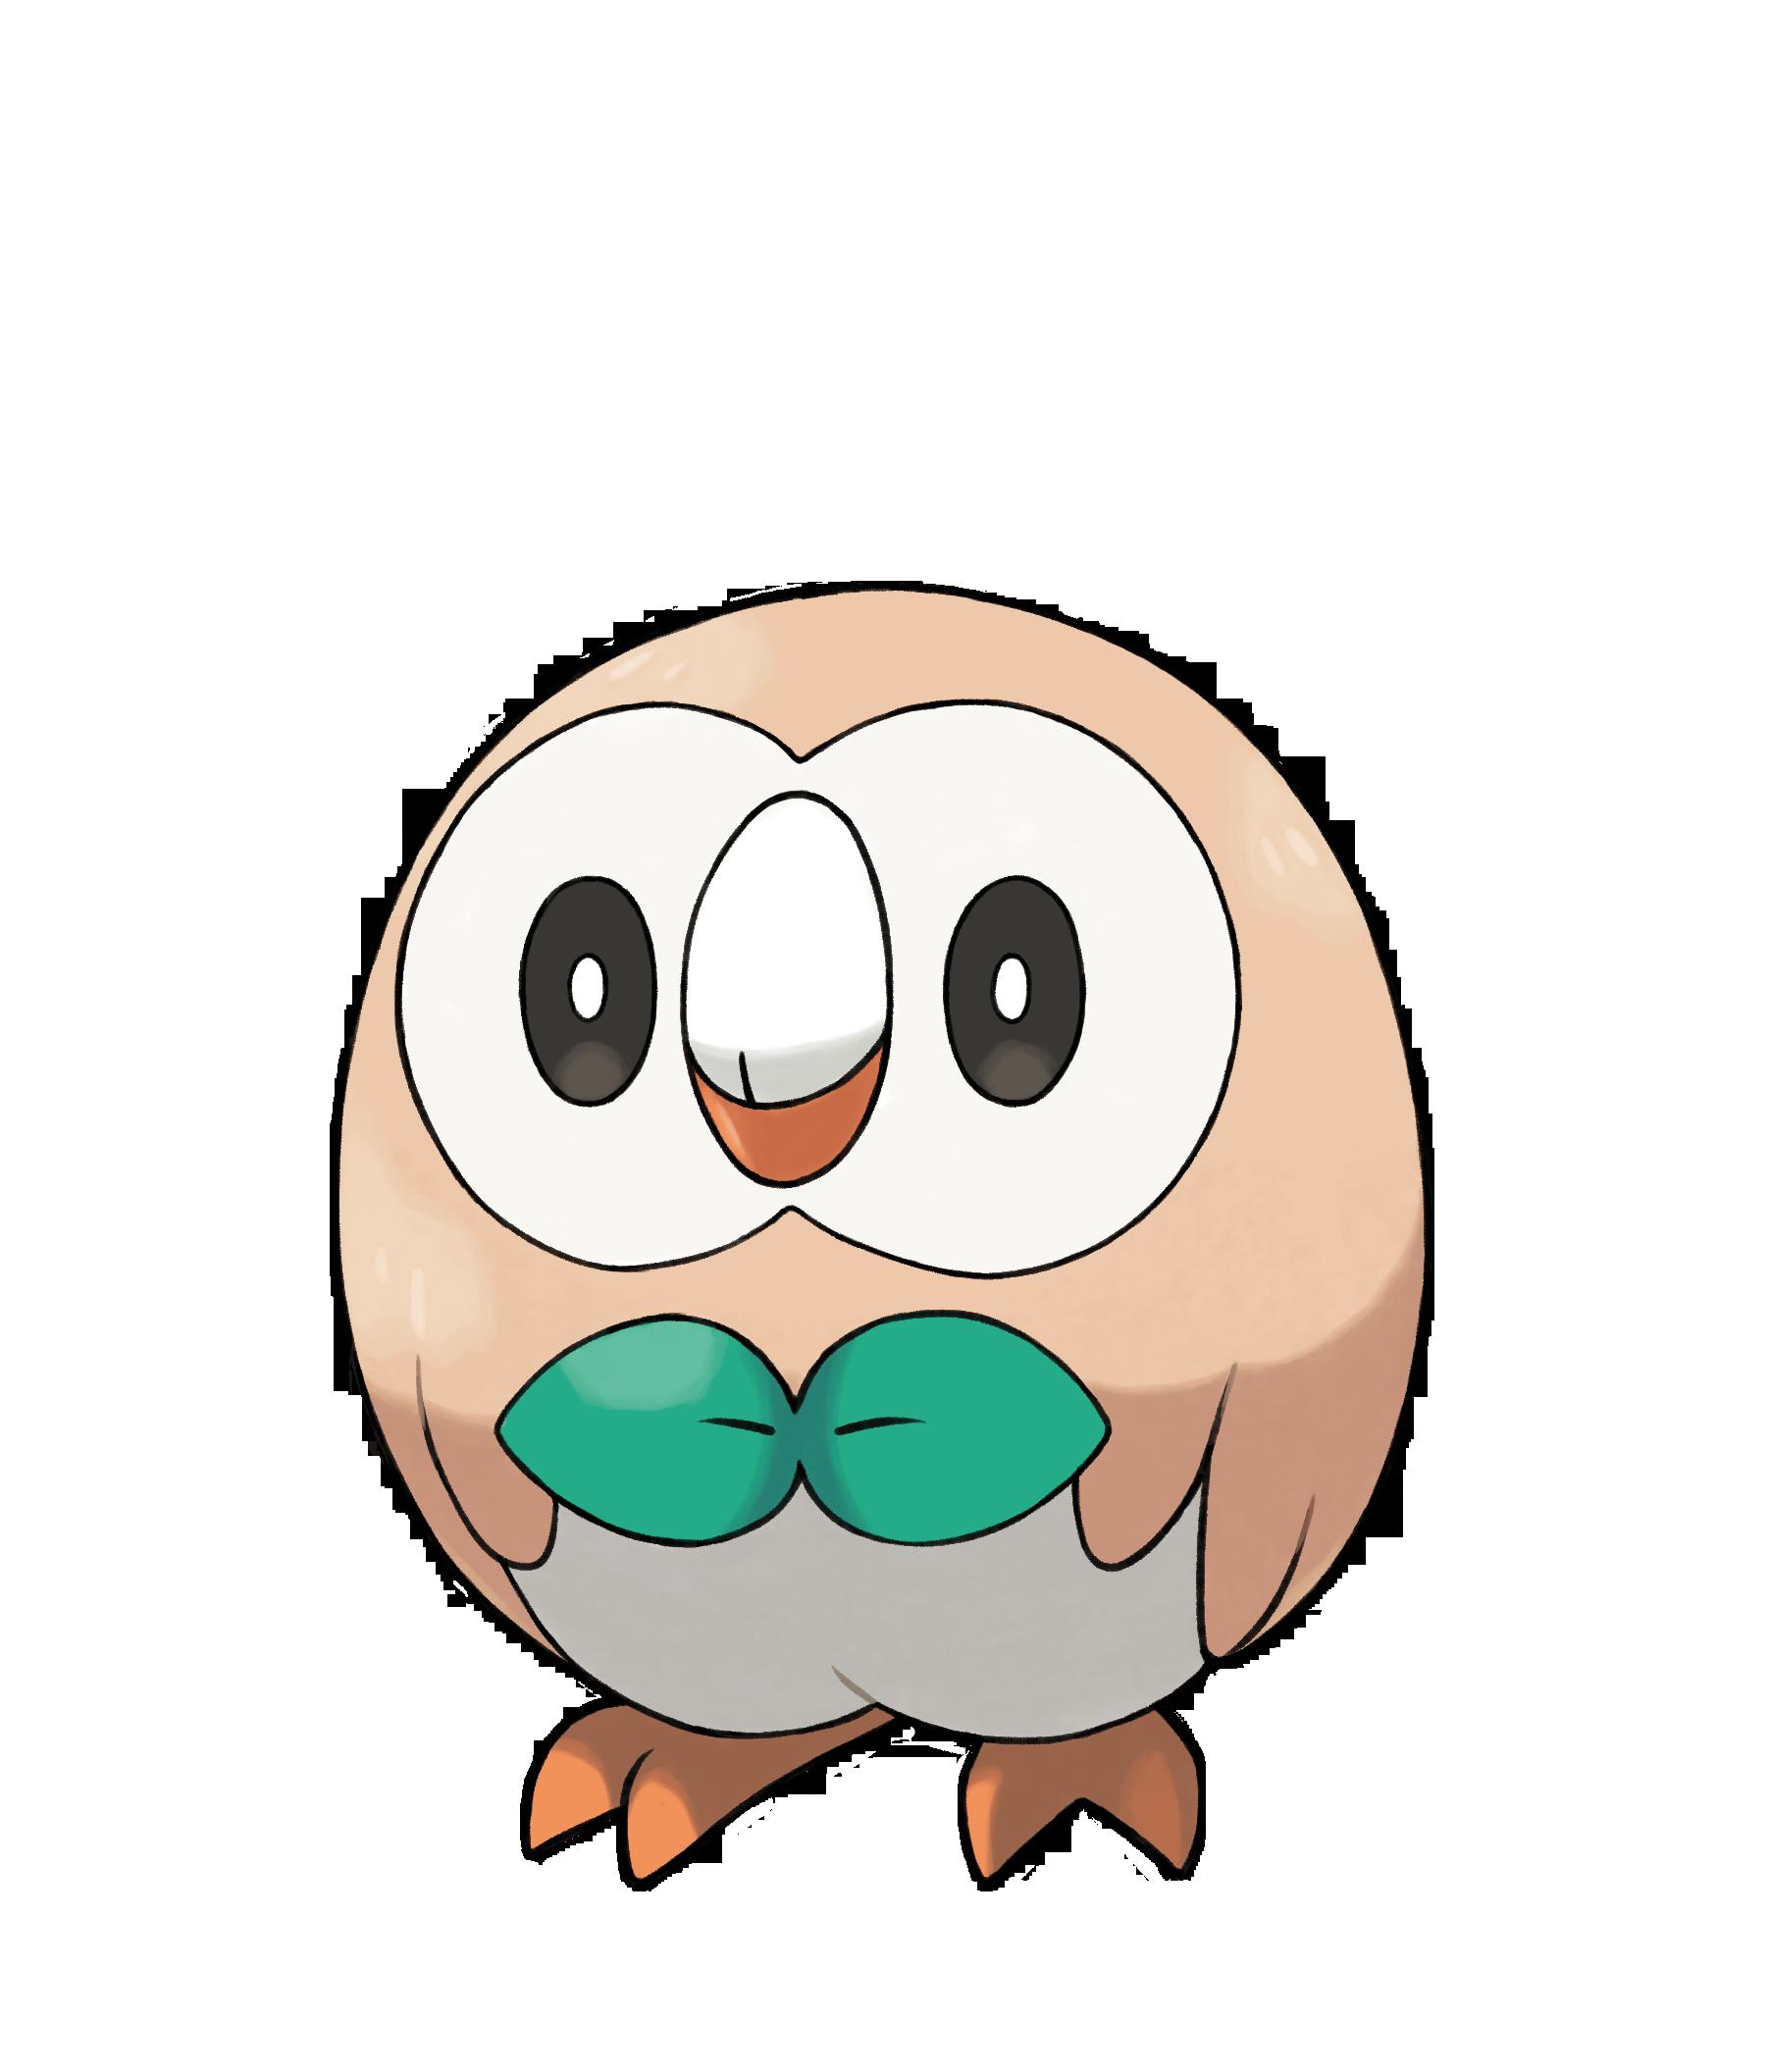 Sun& rainbow clipart free graphic freeuse Pokémon Sun & Moon - Images & Screenshots   GameGrin graphic freeuse